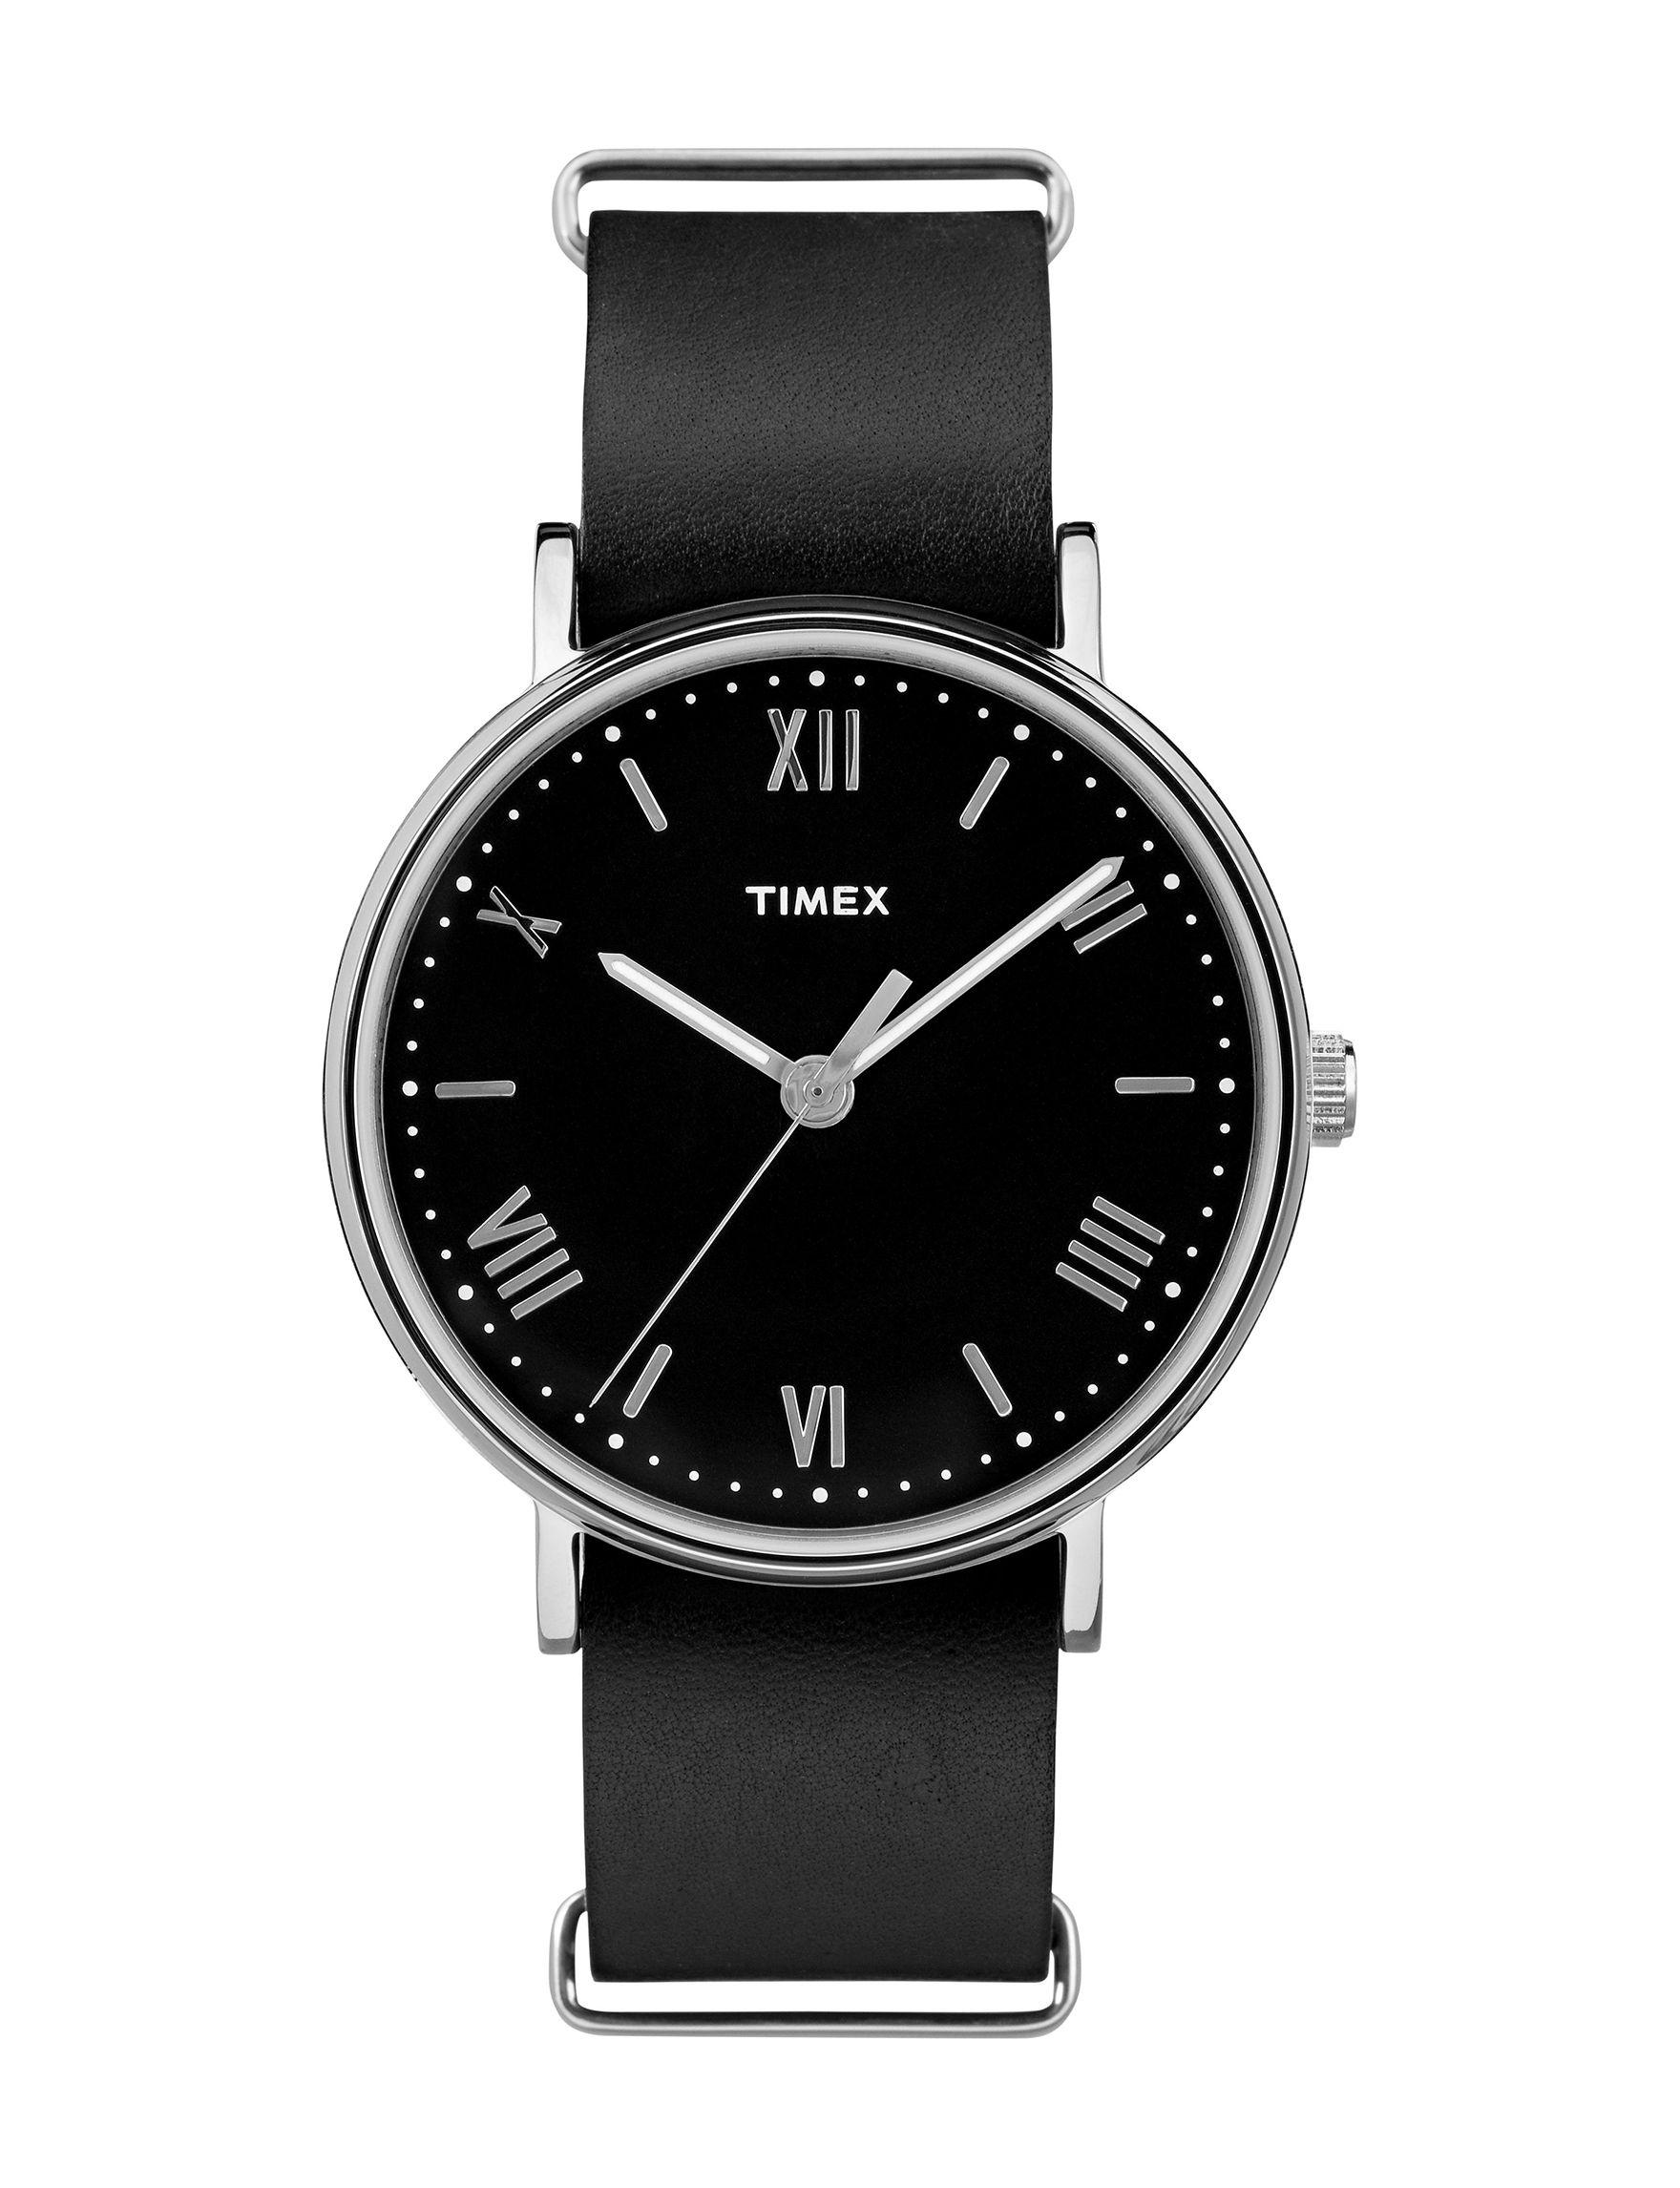 Timex Black Fashion Watches